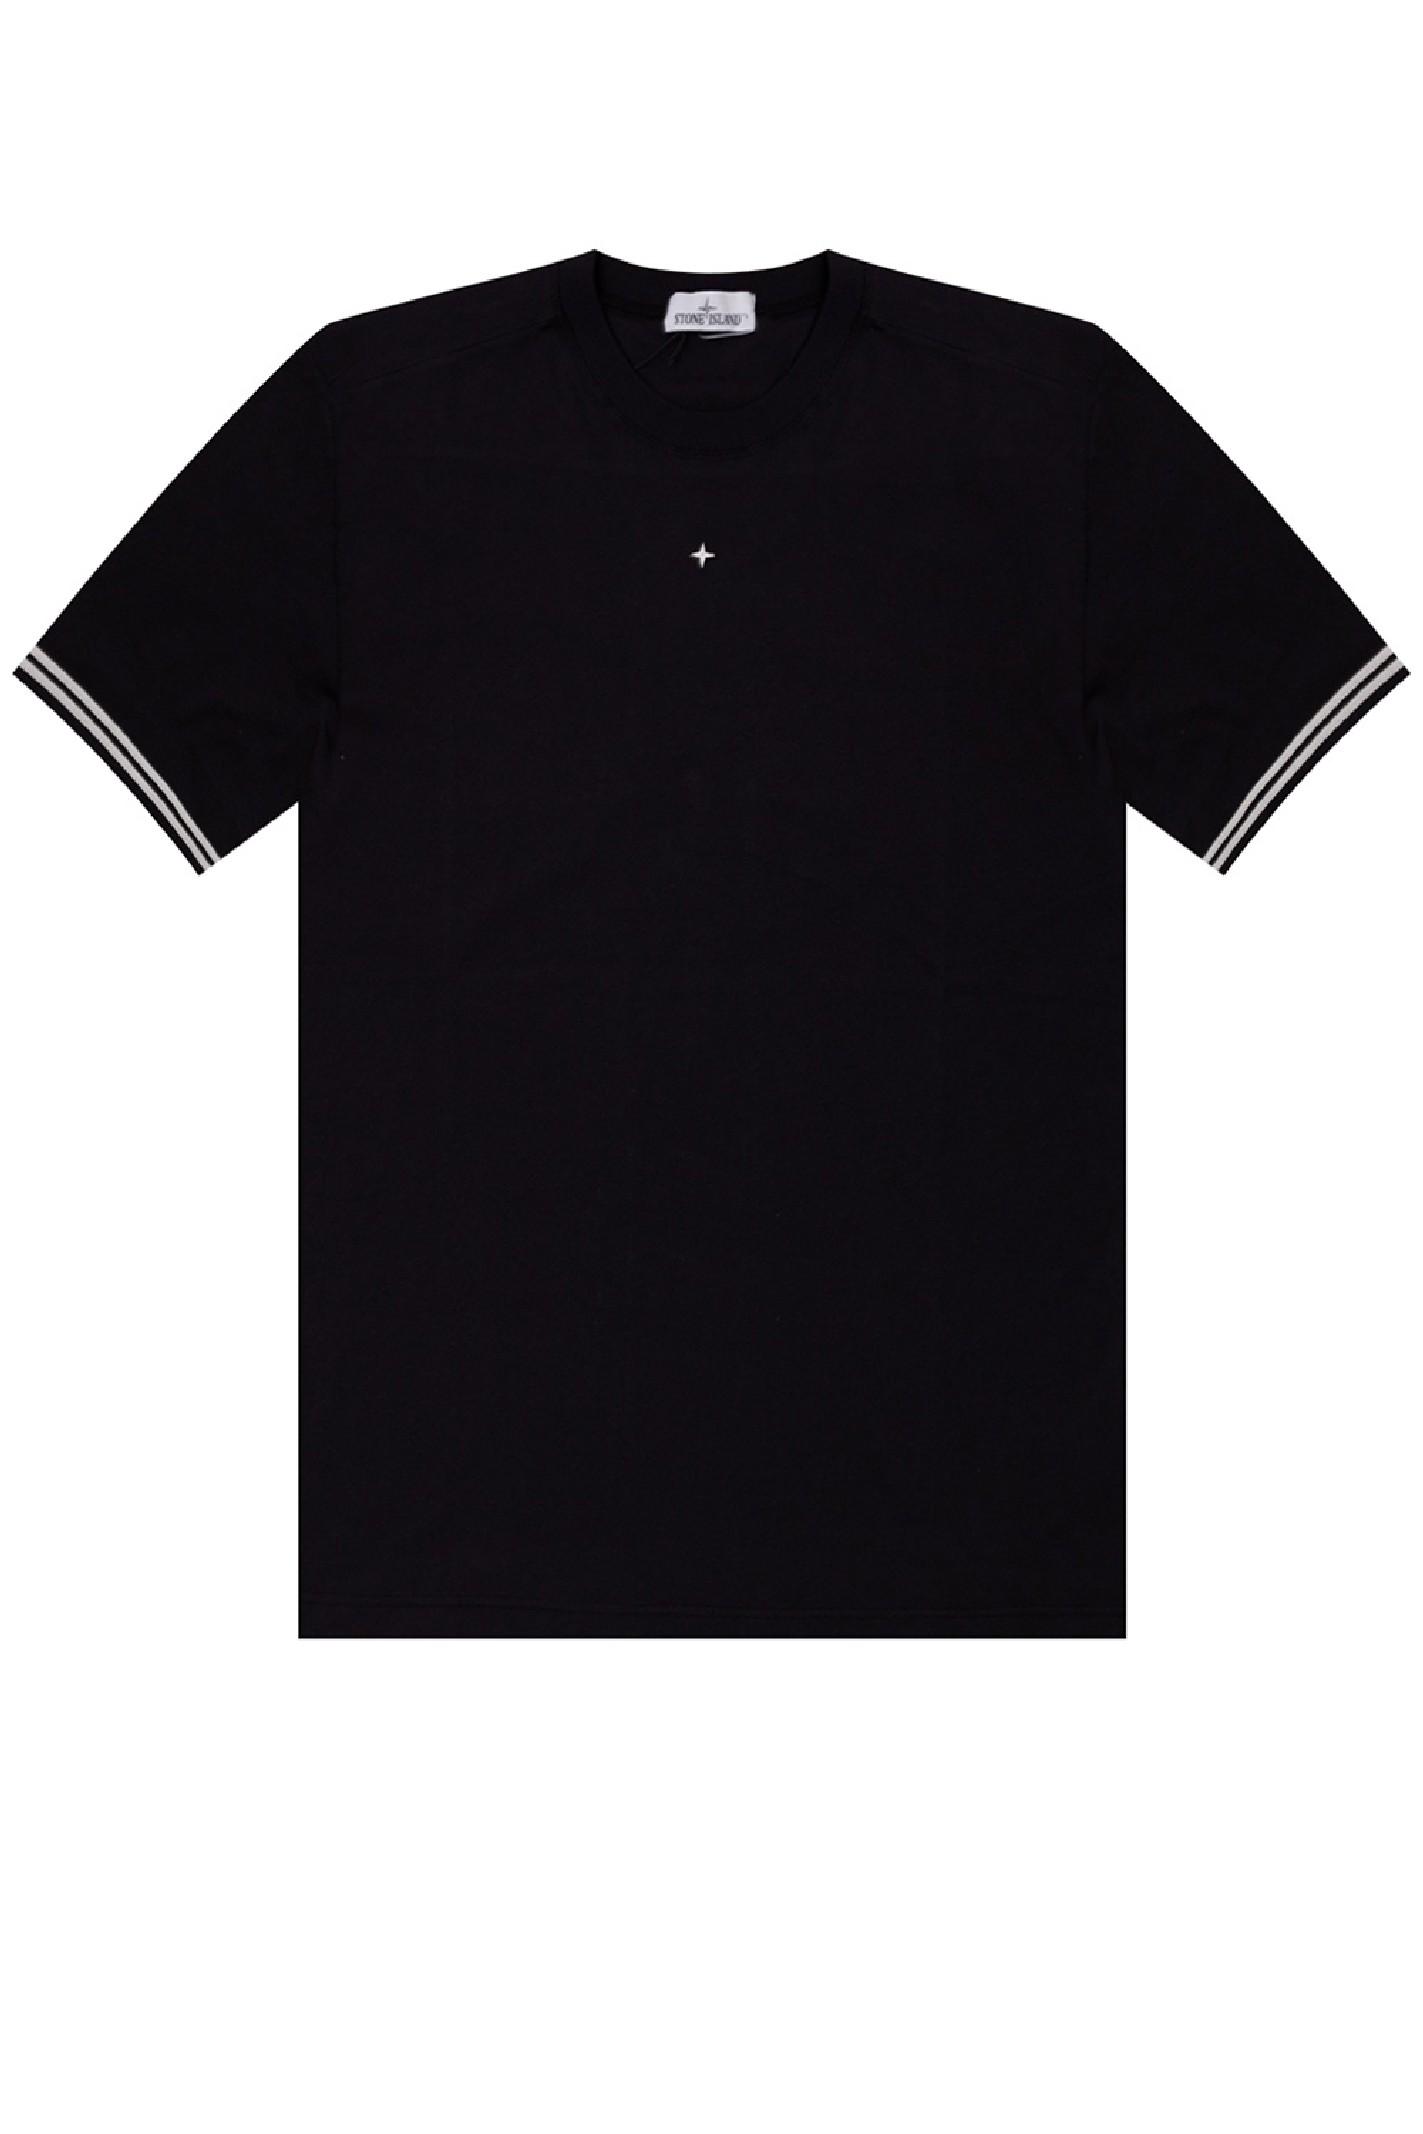 STONE ISLAND | T-shirt | MO741521358V0029